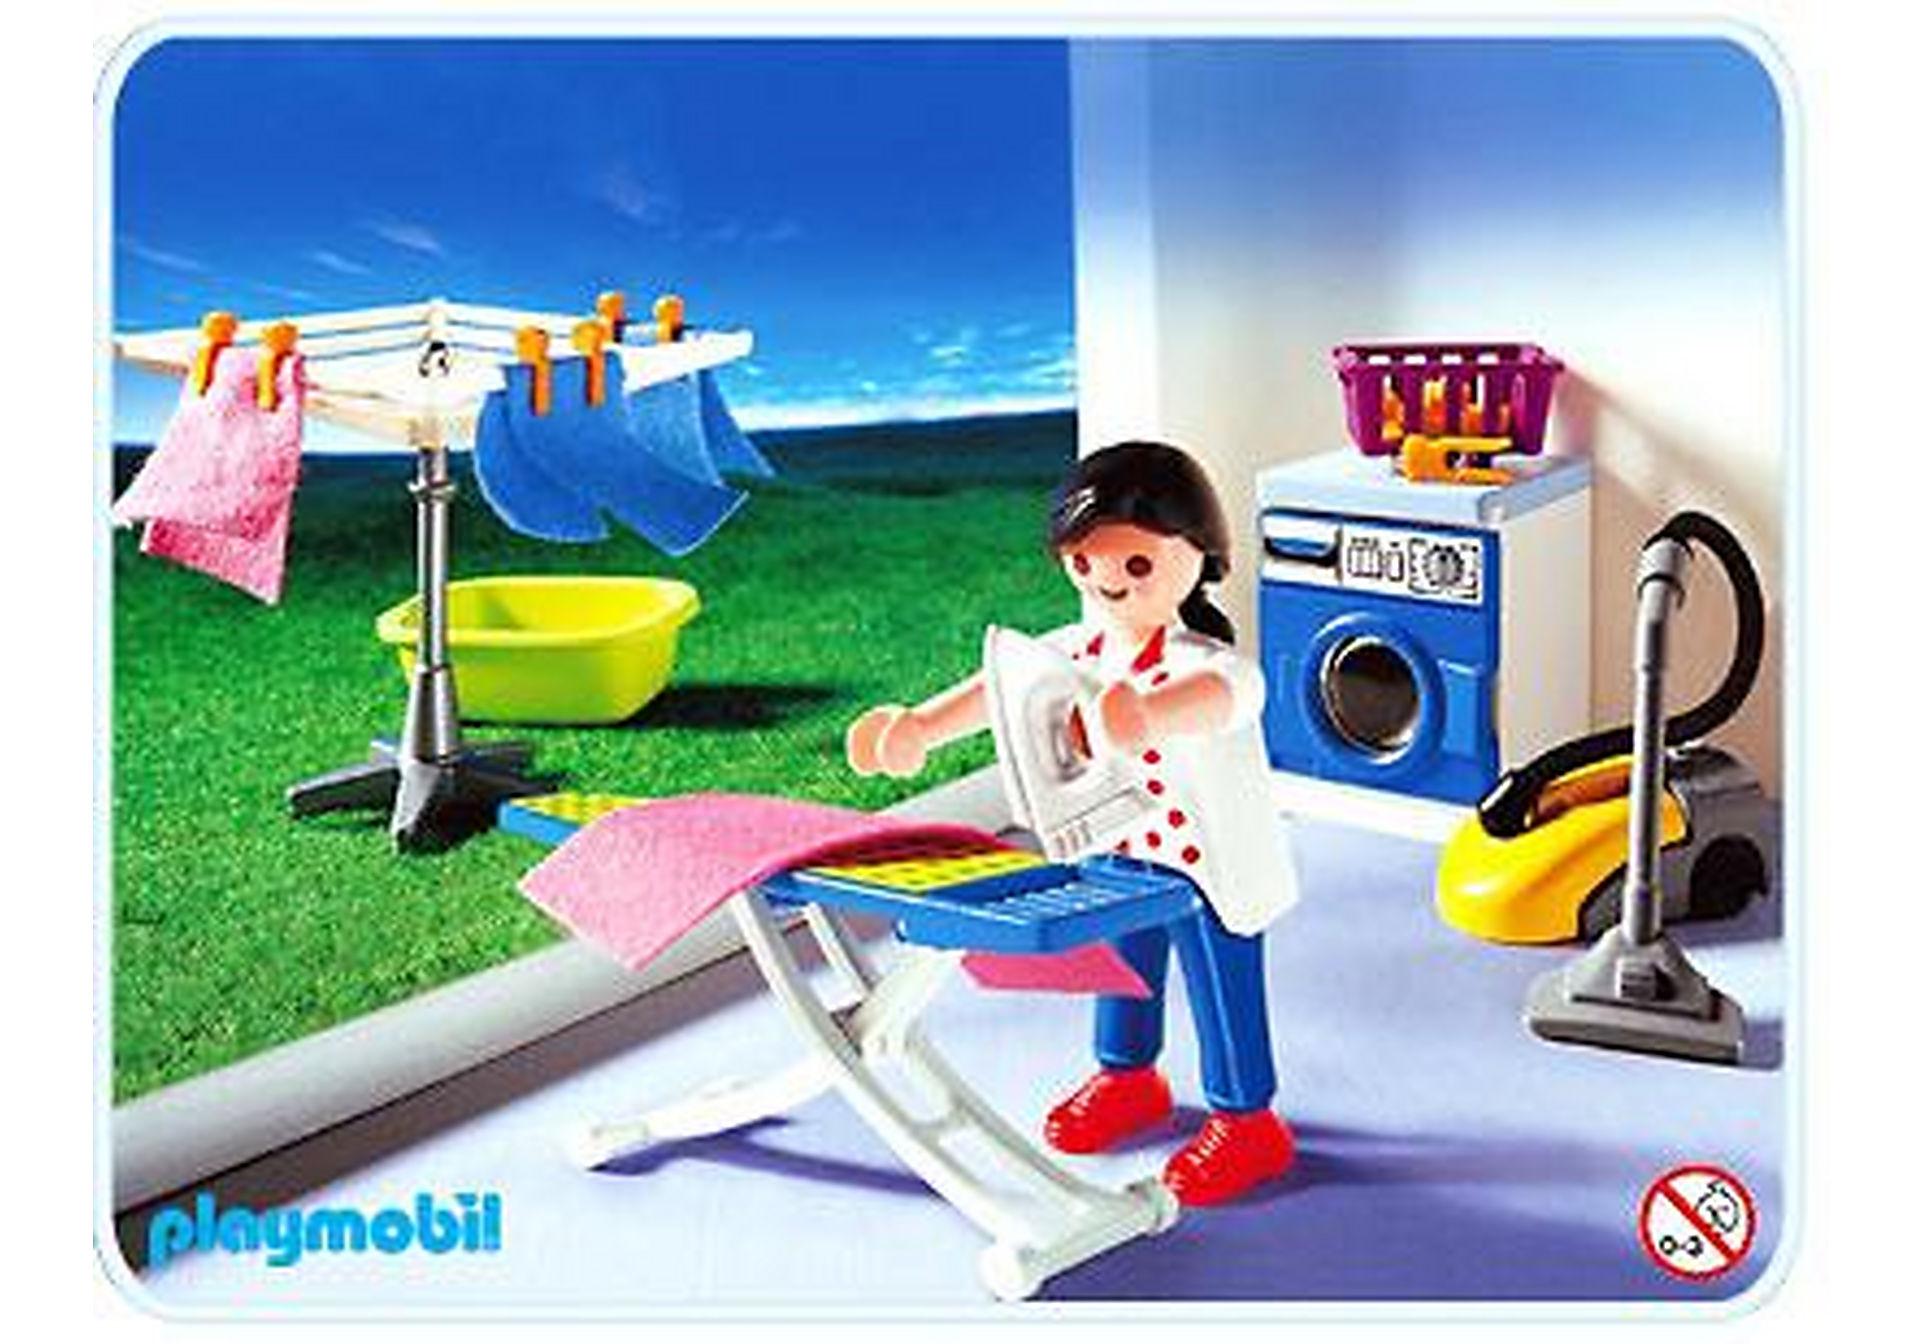 http://media.playmobil.com/i/playmobil/3206-C_product_detail/Hauswirtschaftsraum